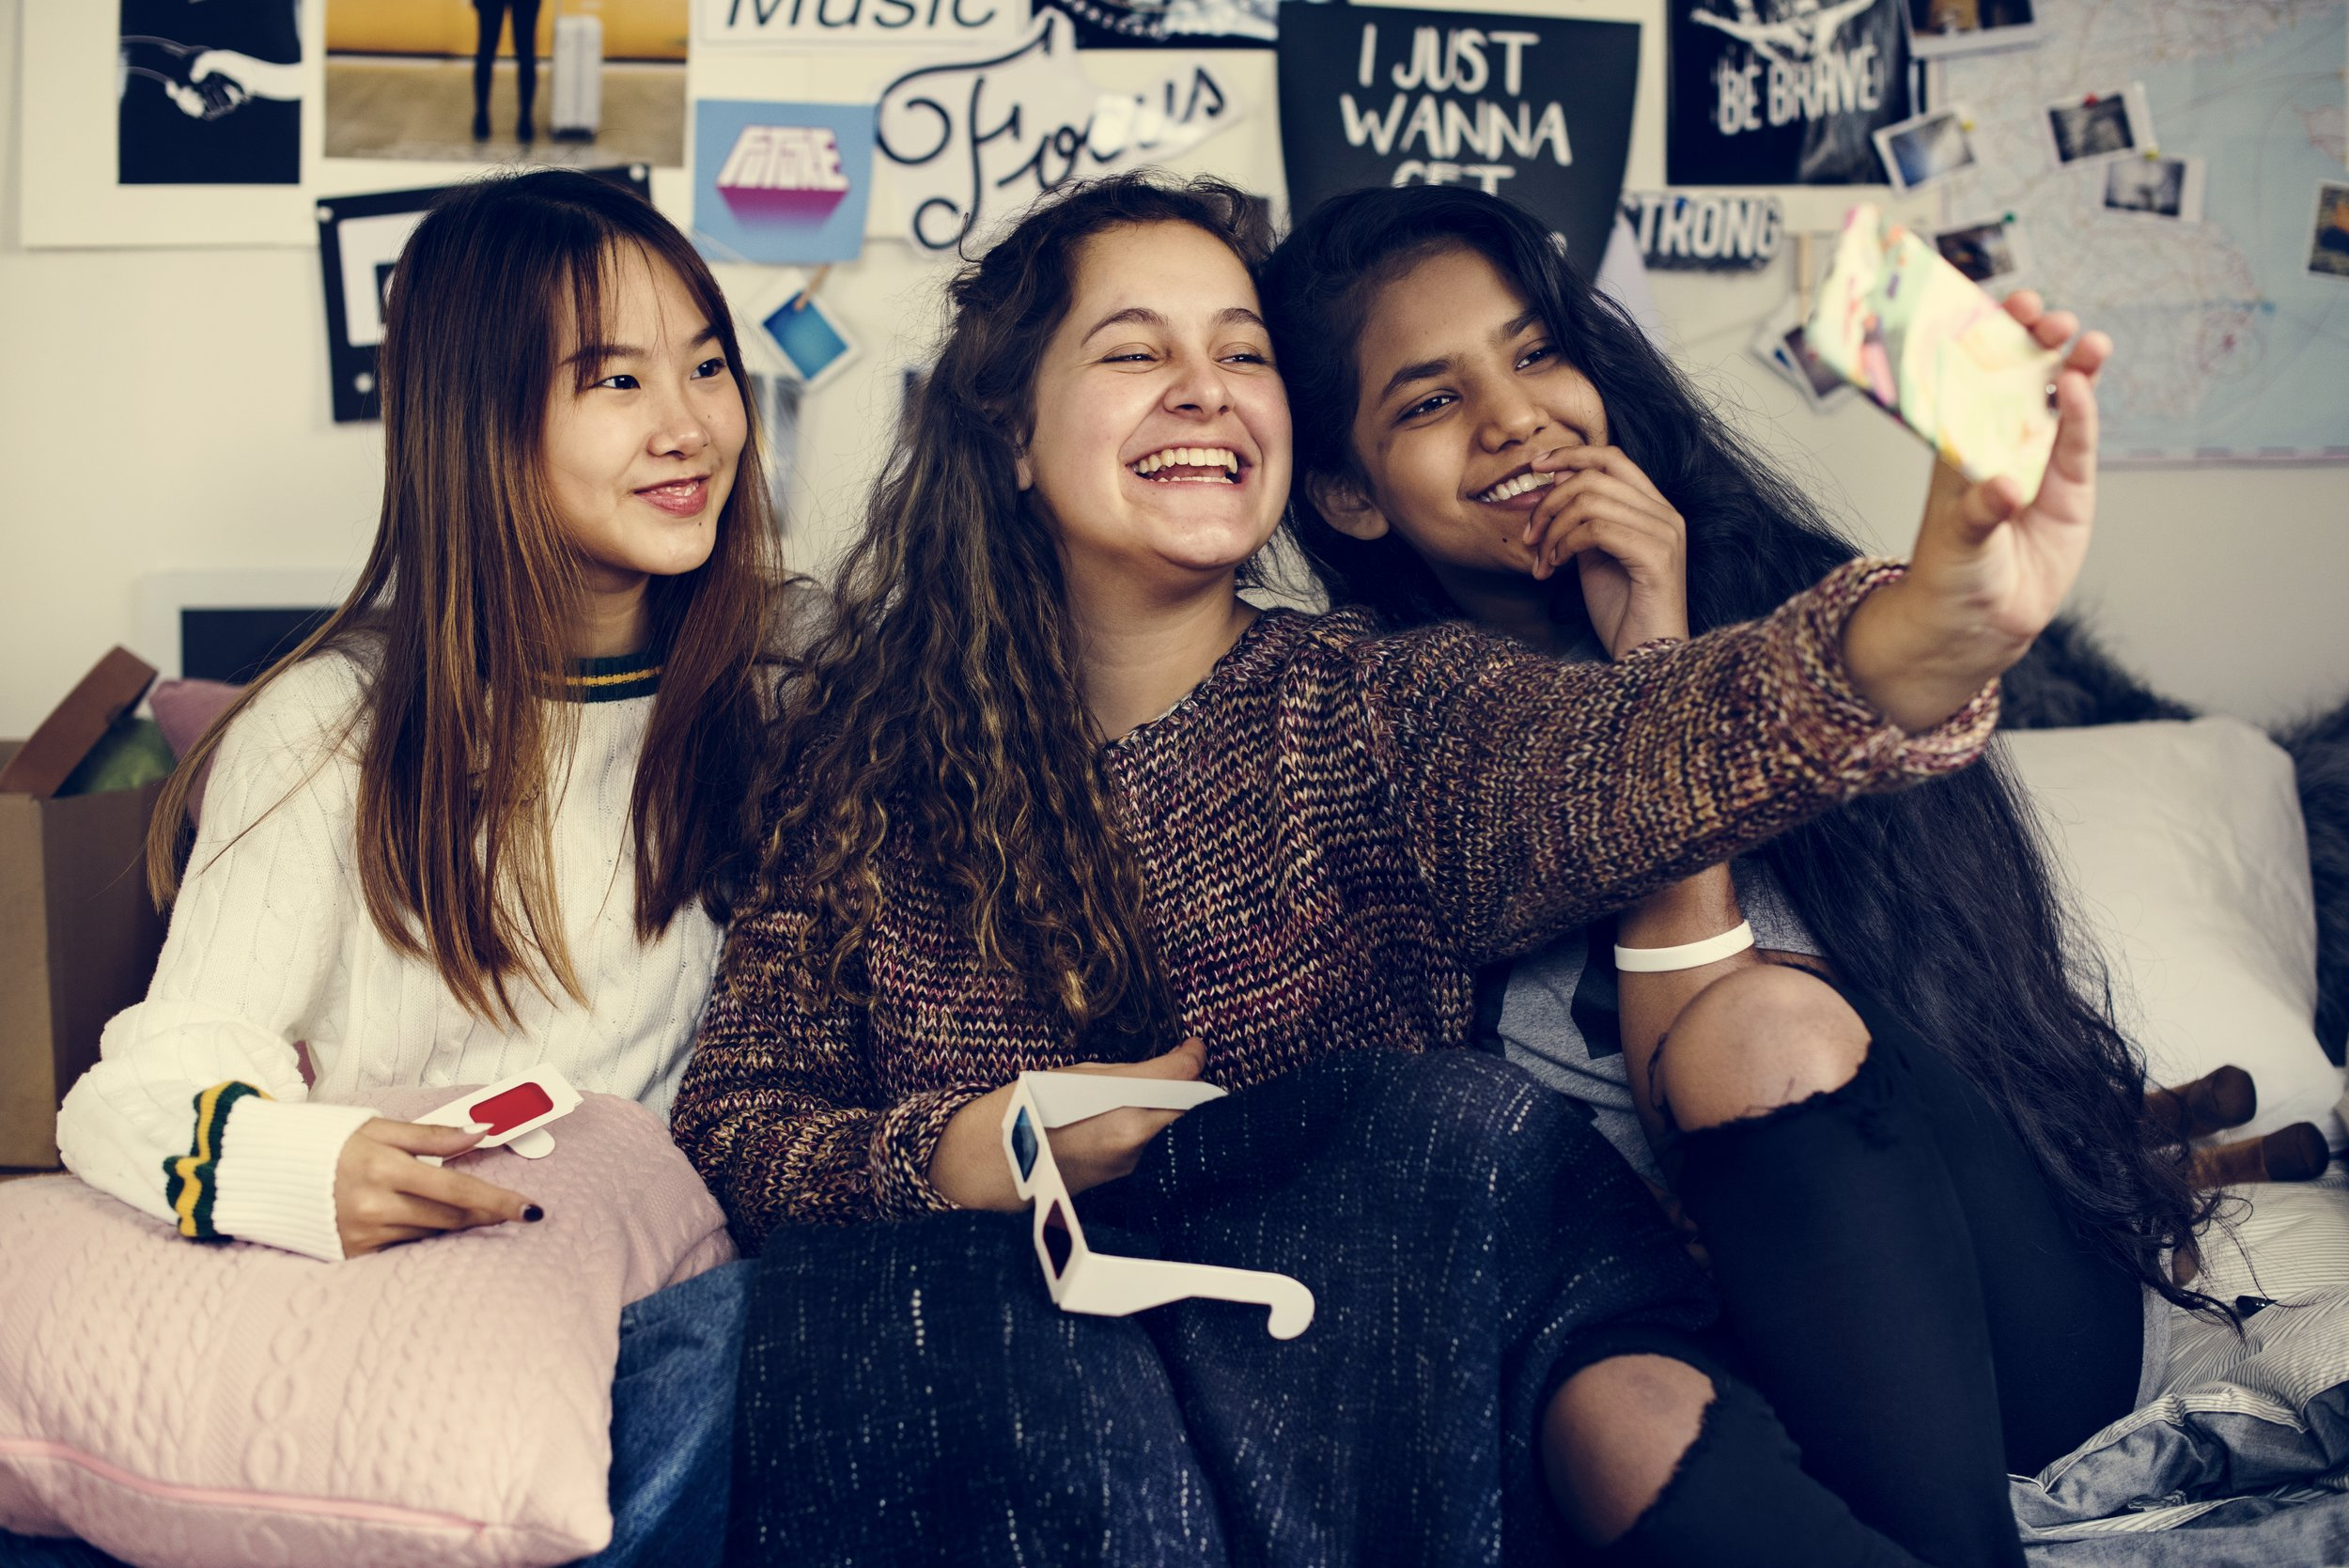 teenage-girls-using-a-smartphone-to-take-a-selfie-3PMFYRH.jpg